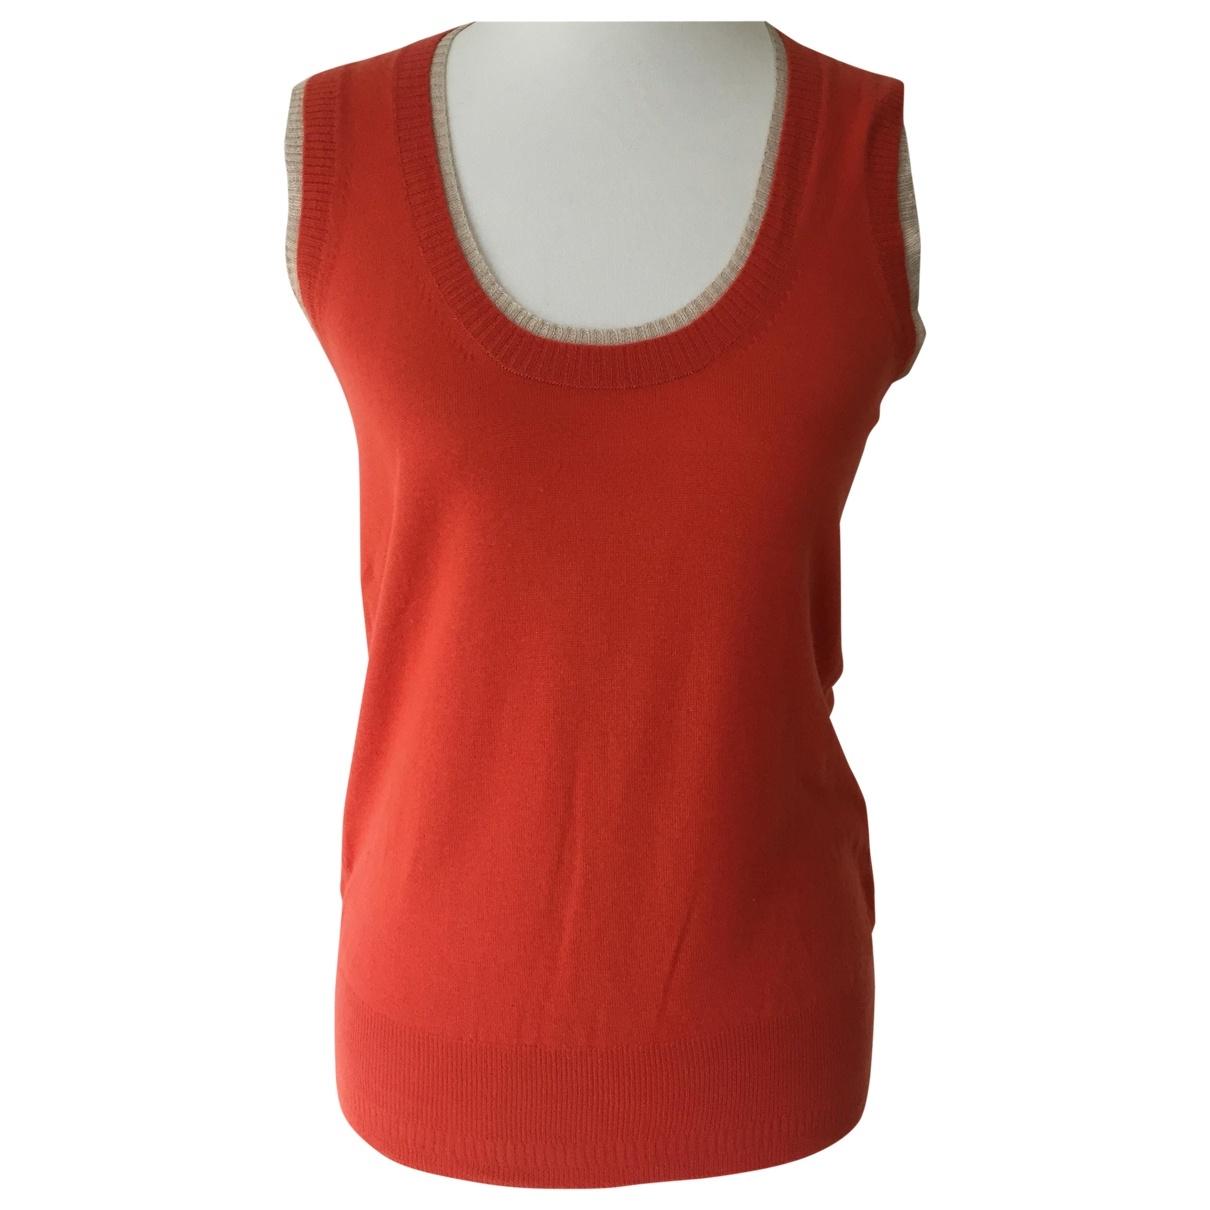 Etro \N Orange Cashmere  top for Women 44 IT